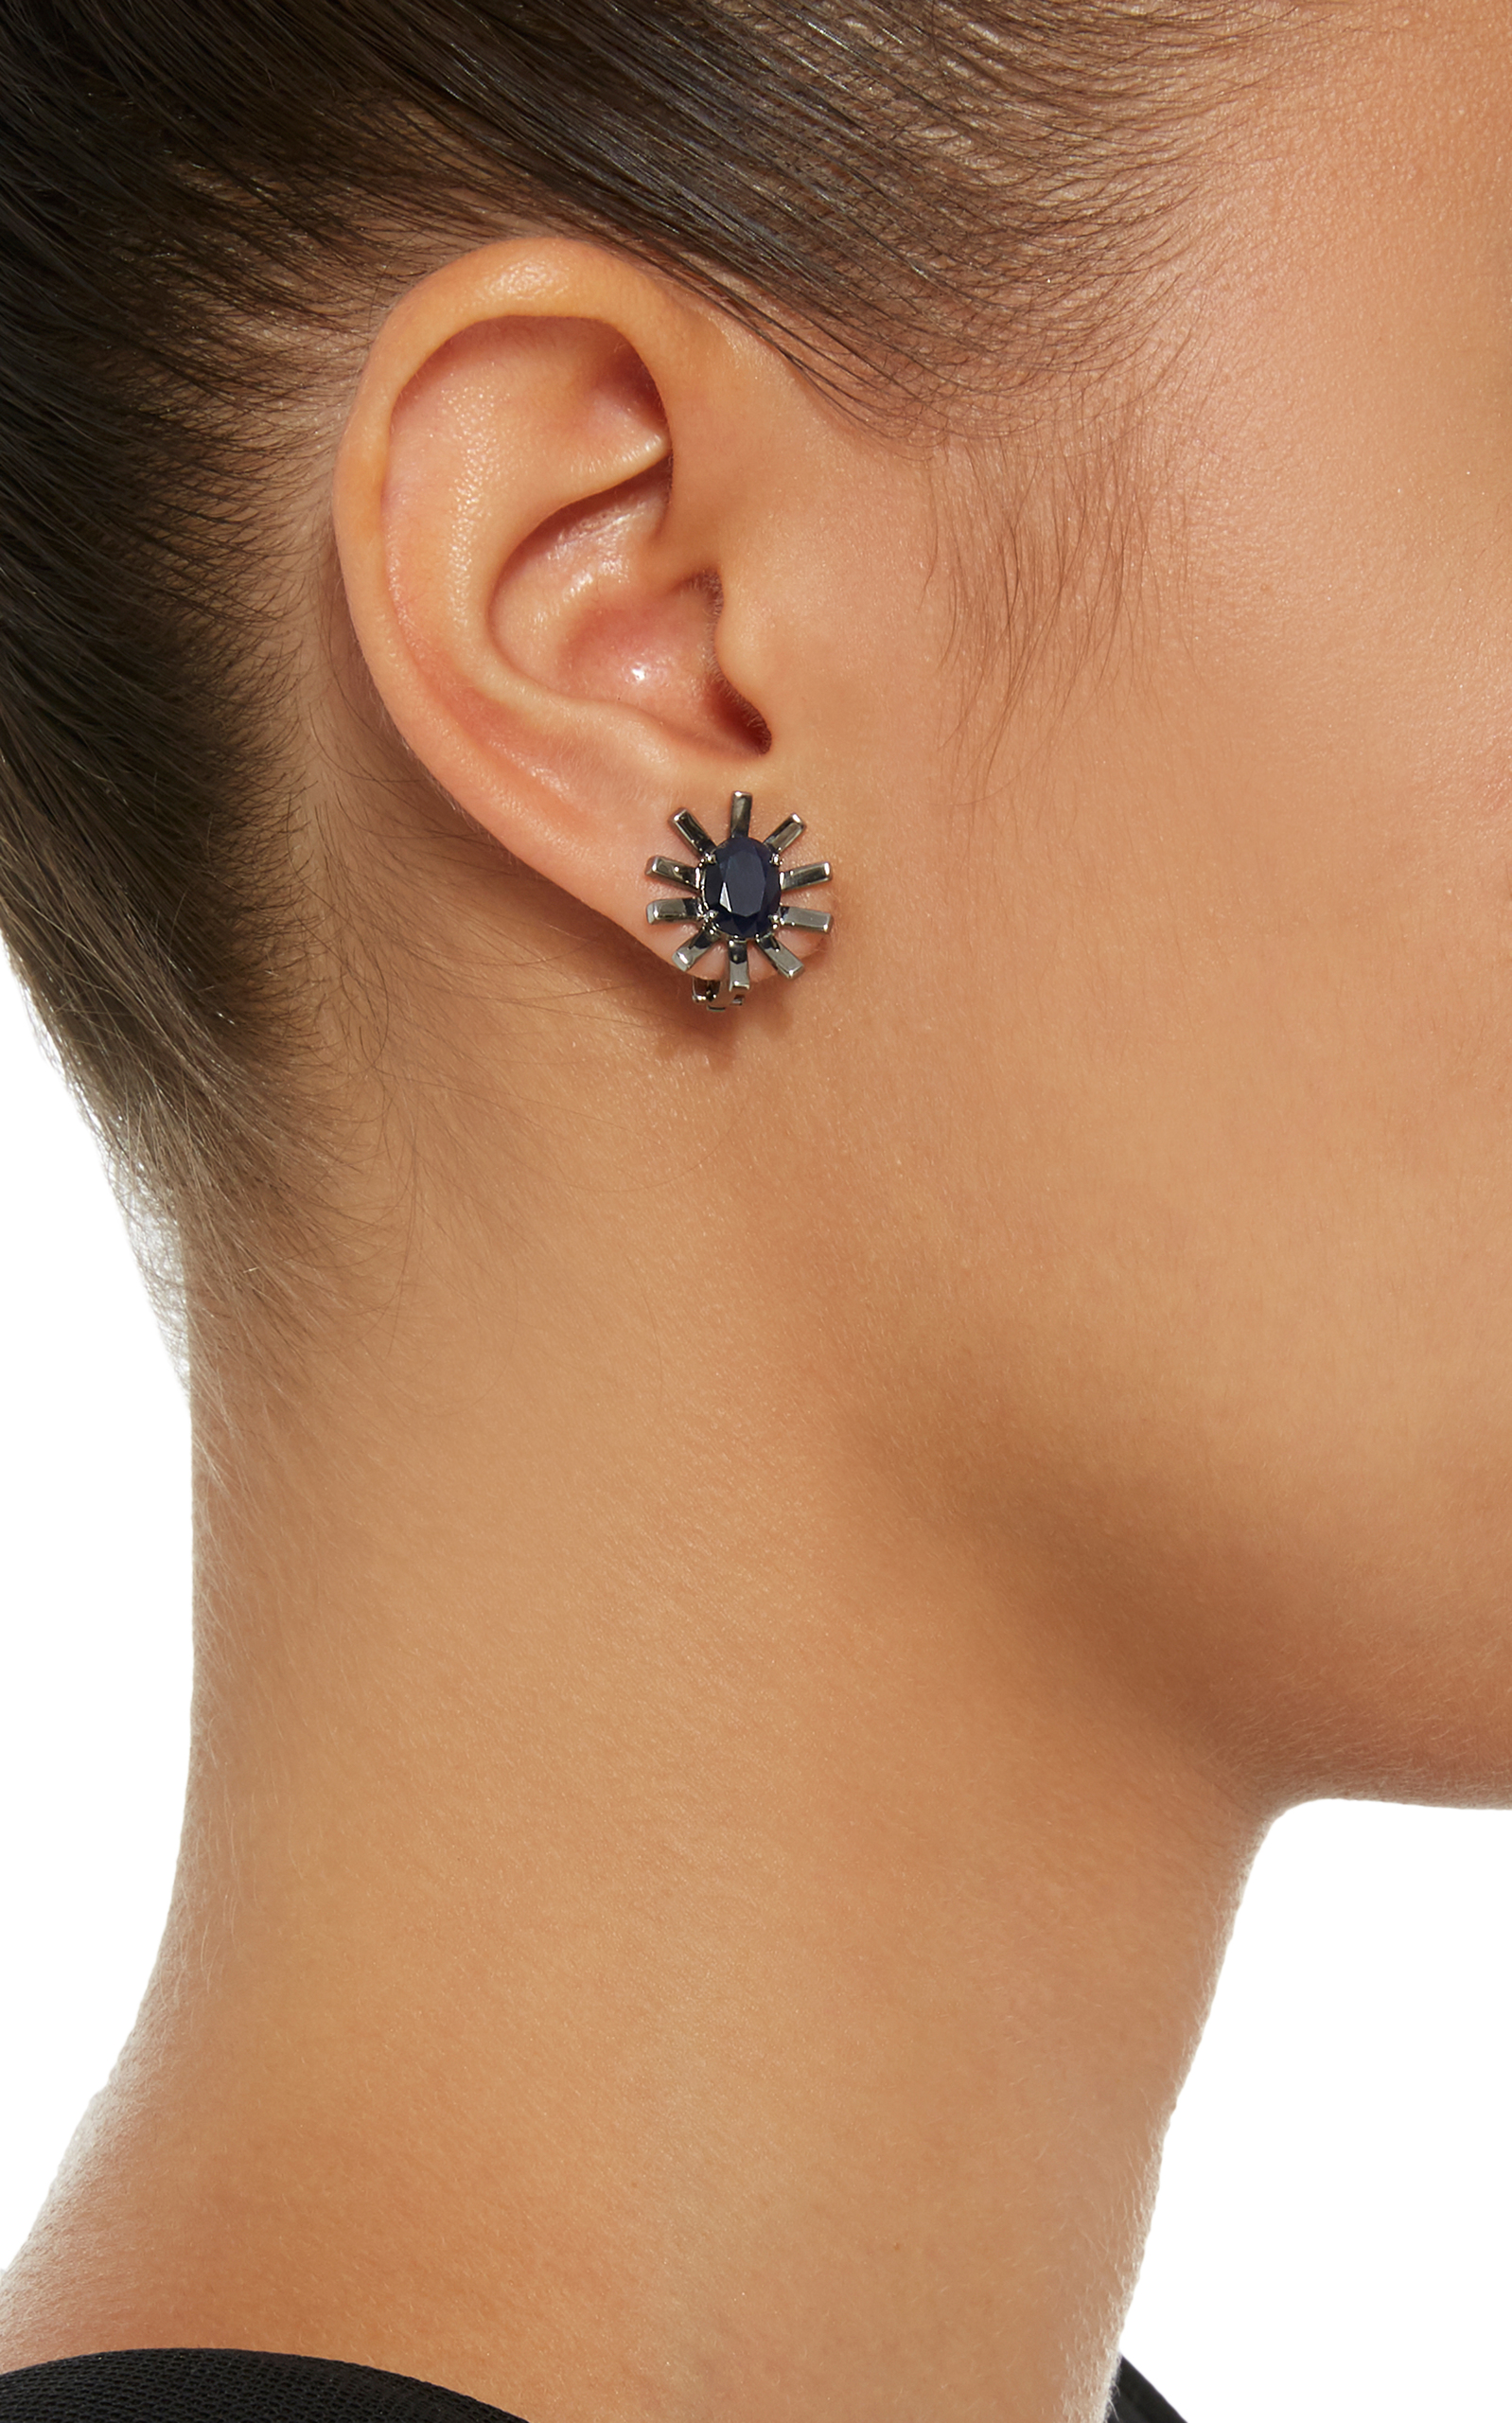 18K White Gold and Black Rhodium Sapphire Earrings Jack Vartanian gJamTAxVh